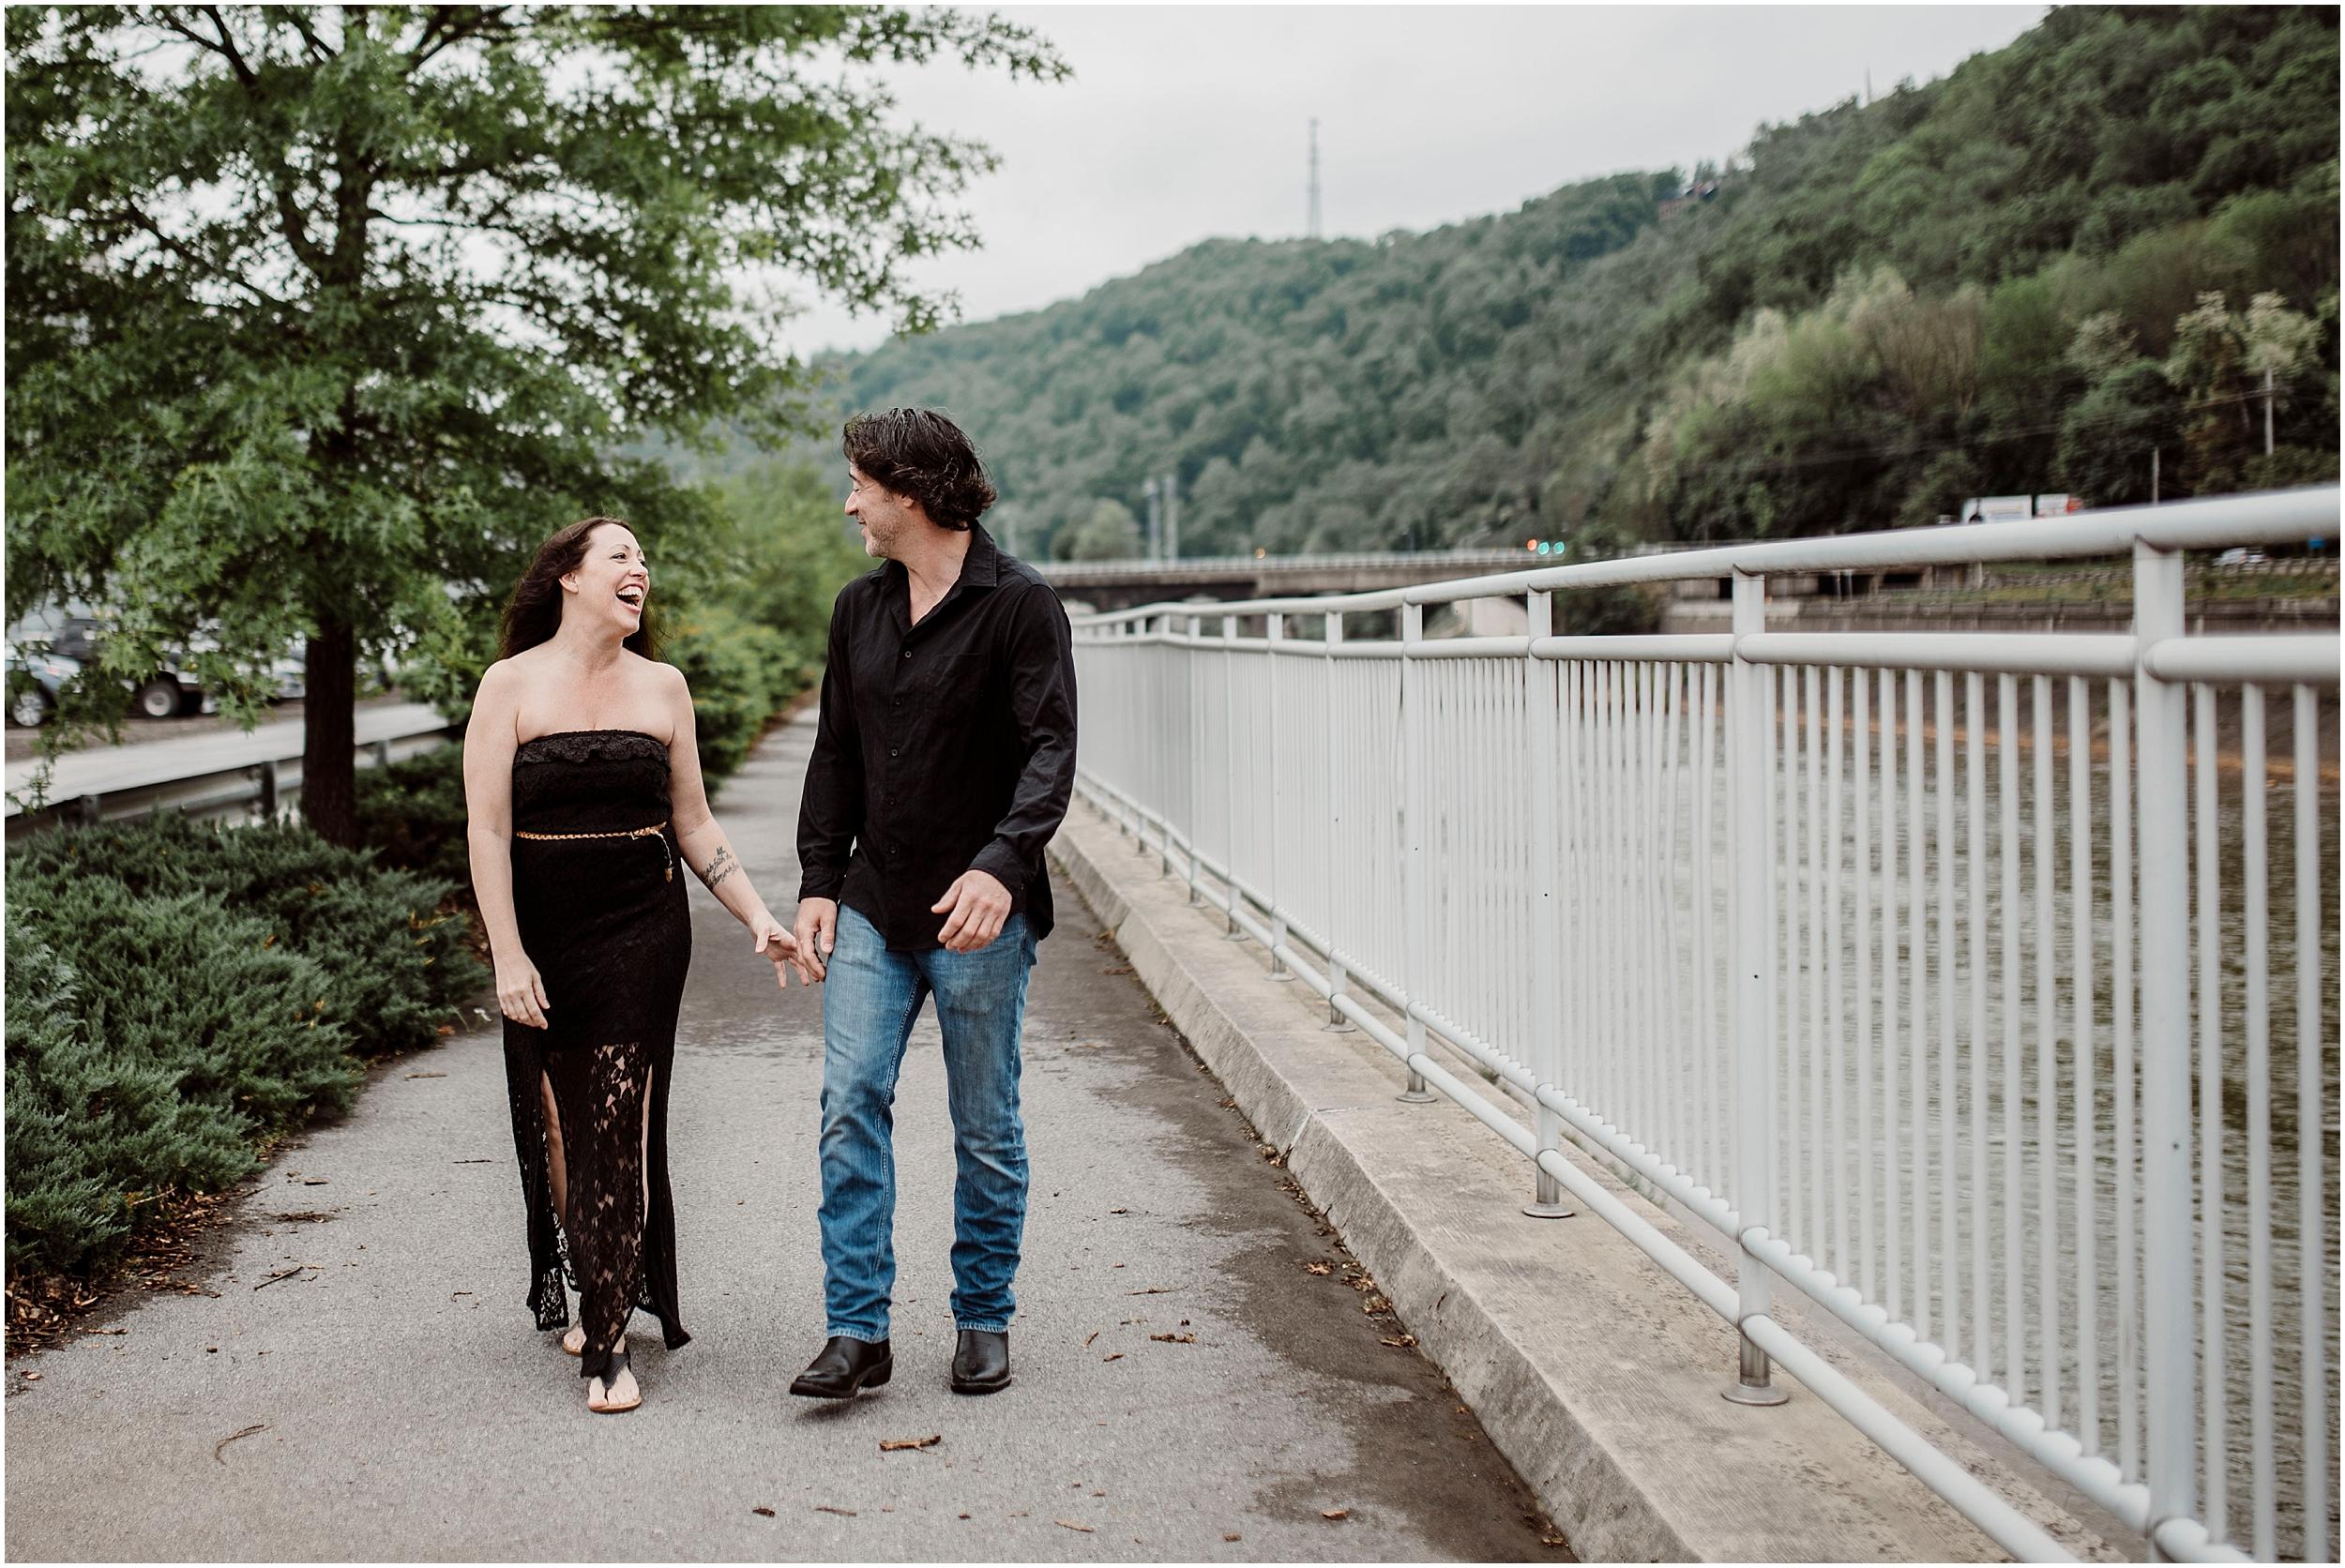 Pittsburgh-wedding-photographer-sandrachile_0008.jpg